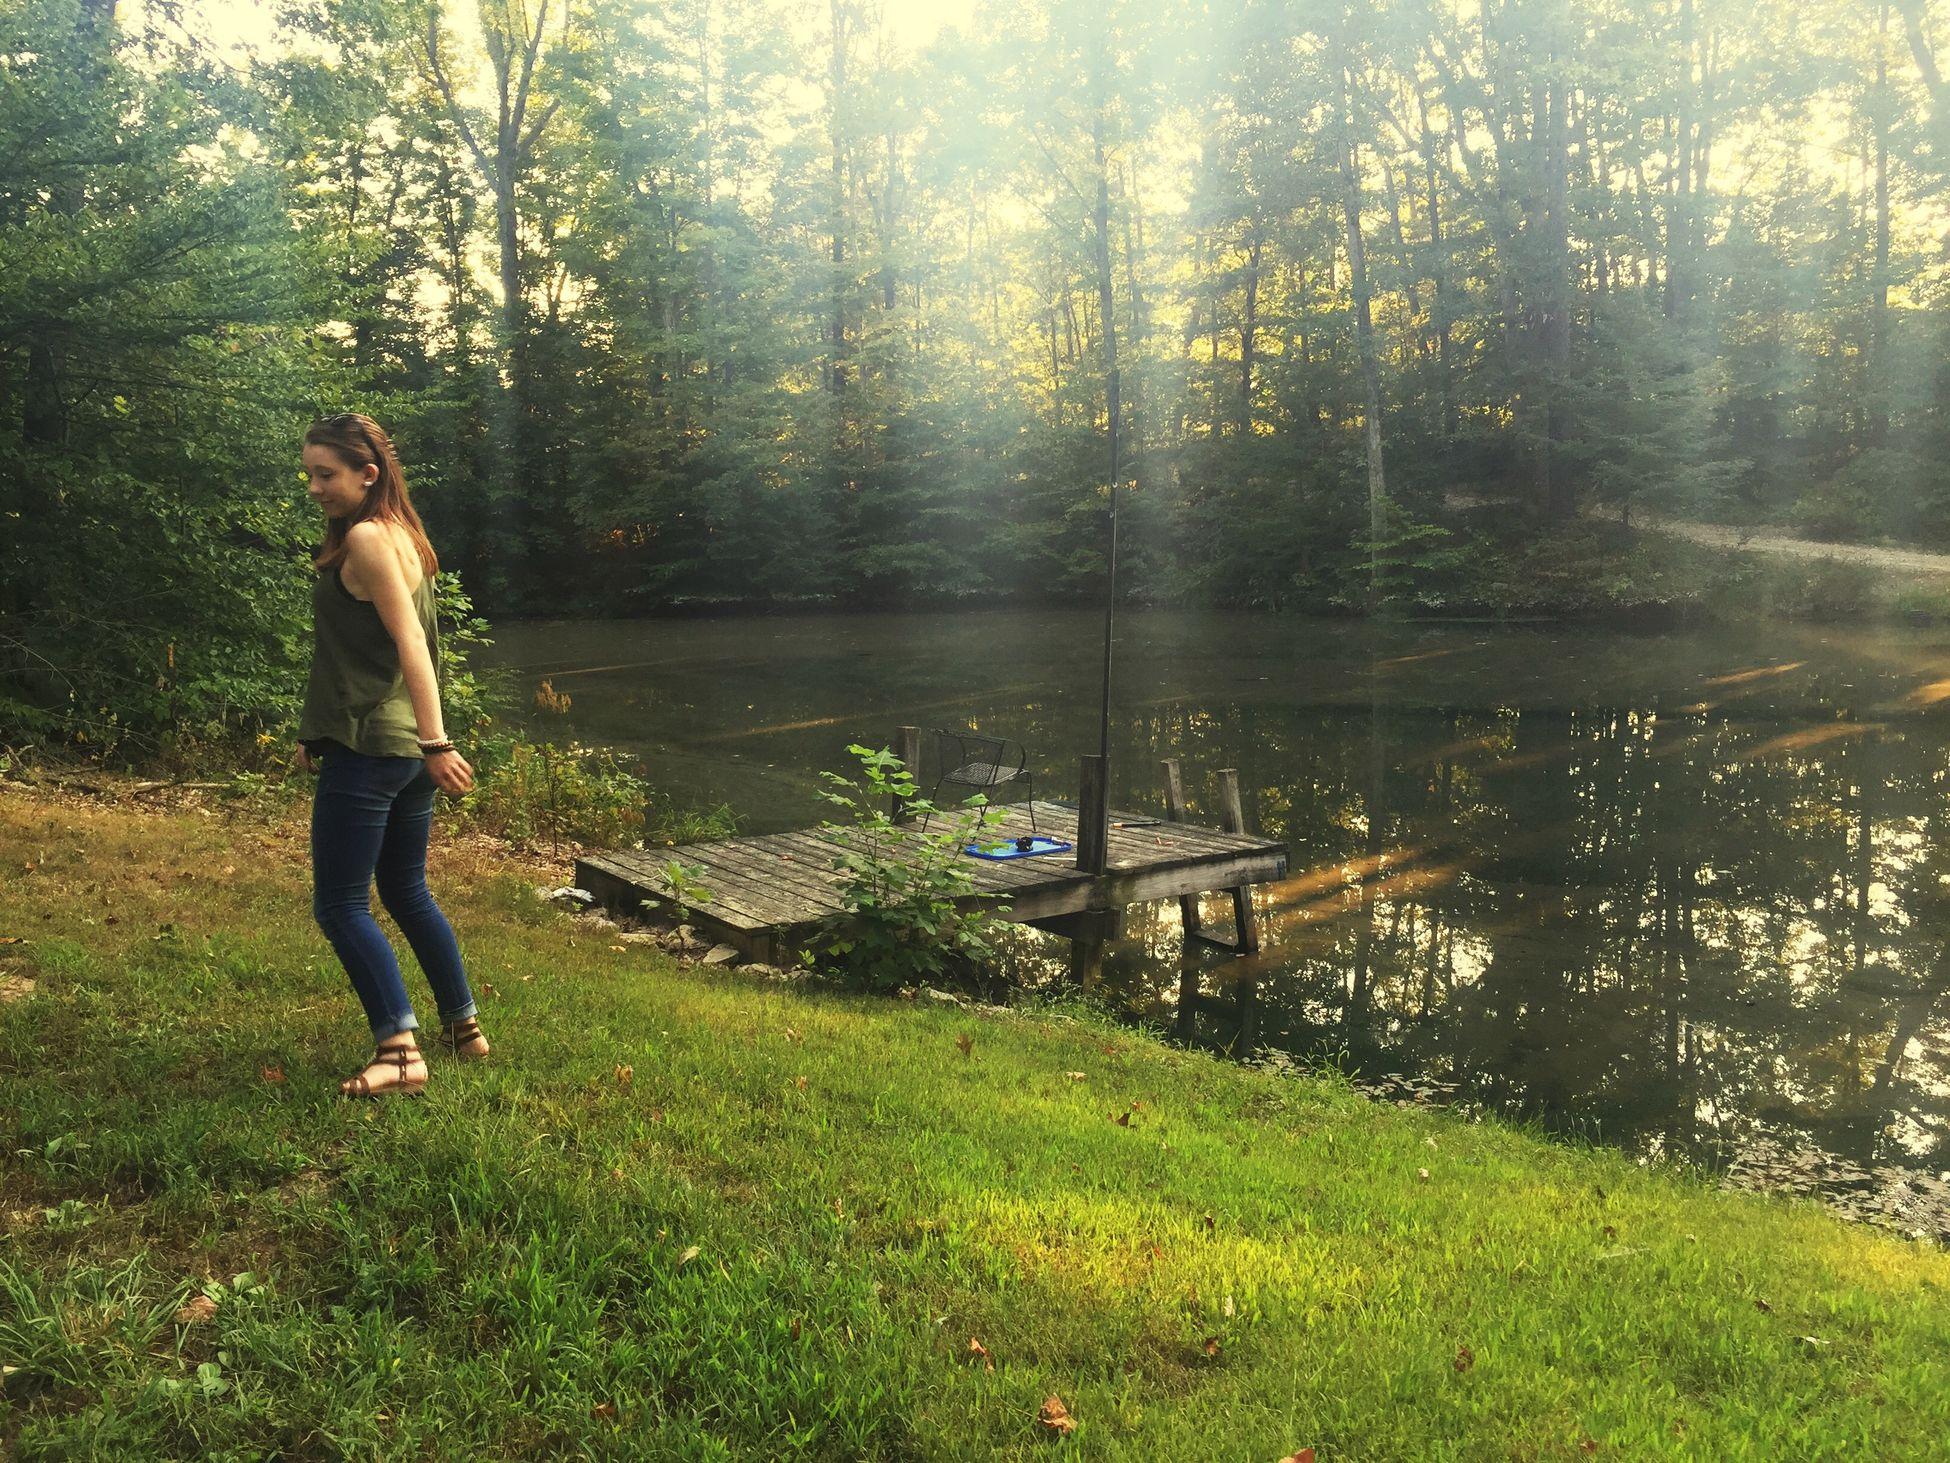 Lake Dancing Capturing Freedom